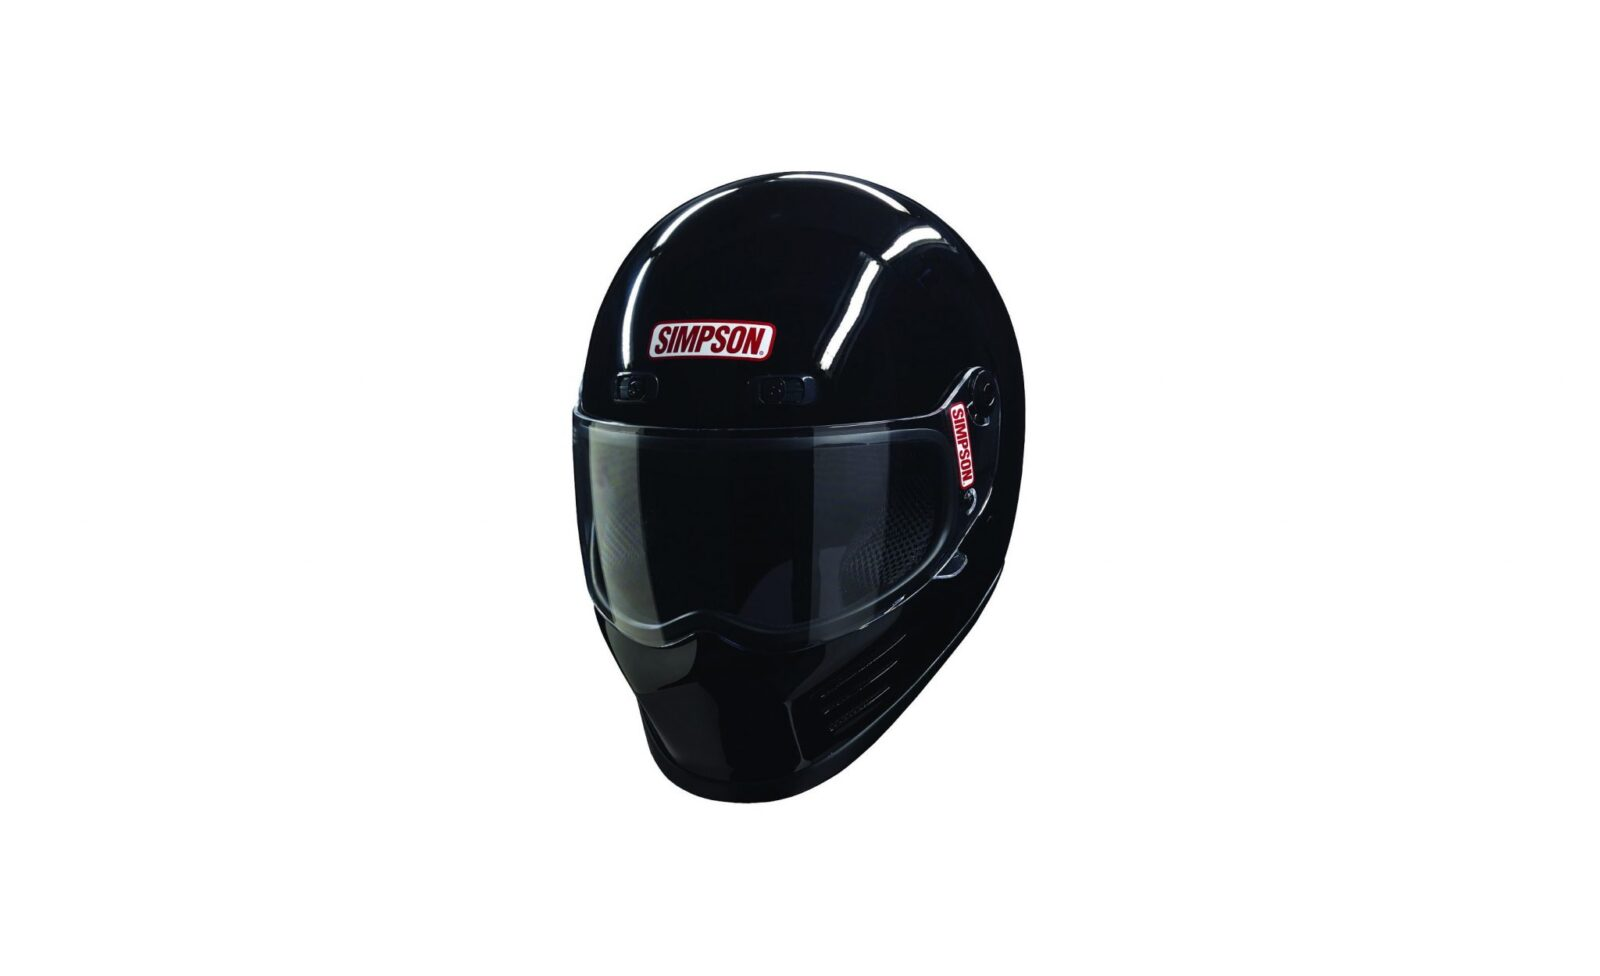 Simpson Street Bandit Helmet 1600x976 - Simpson Street Bandit Helmet